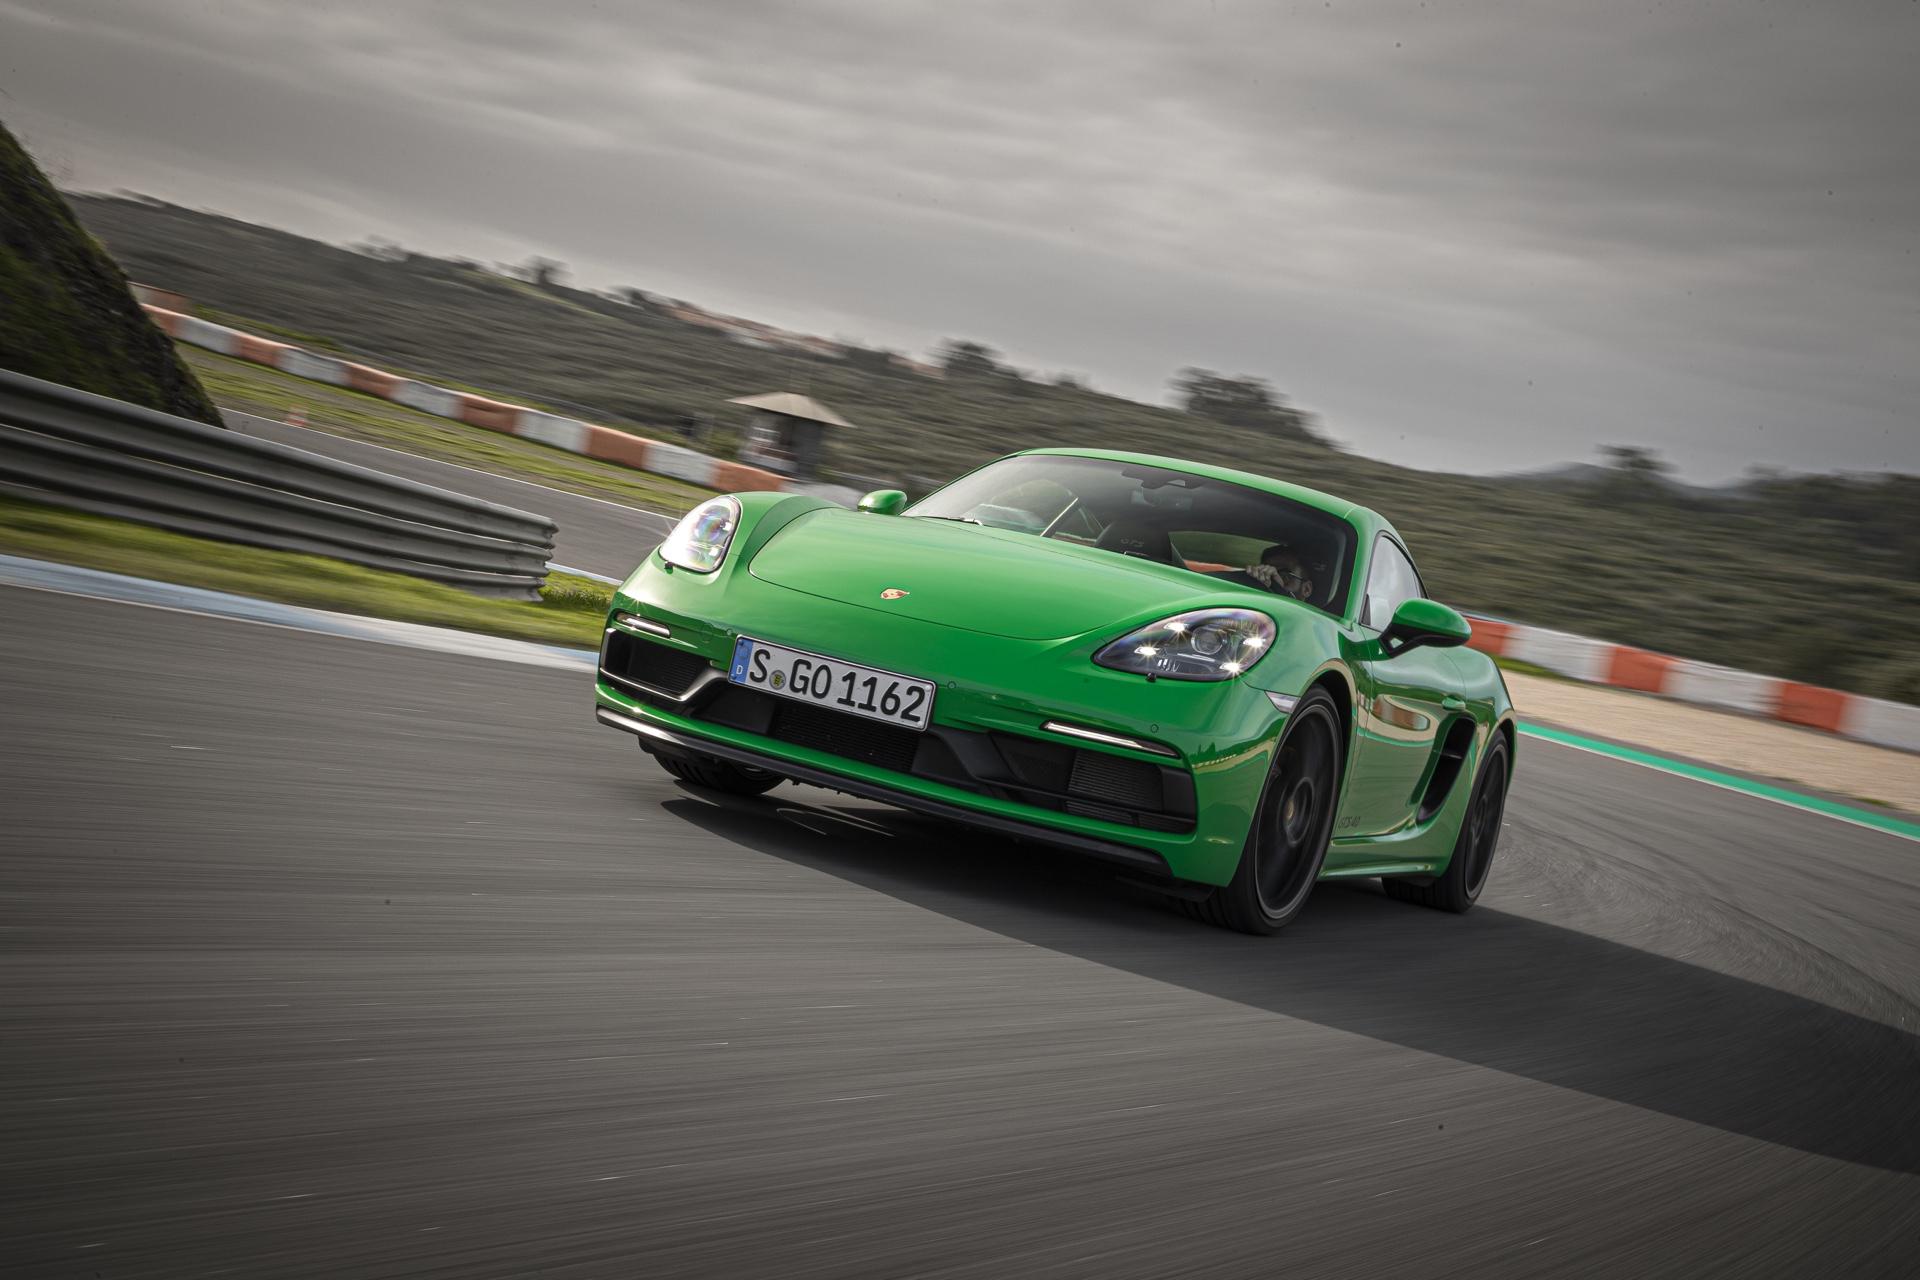 2020 Porsche Cayman & Boxster GTS 4.0 Review